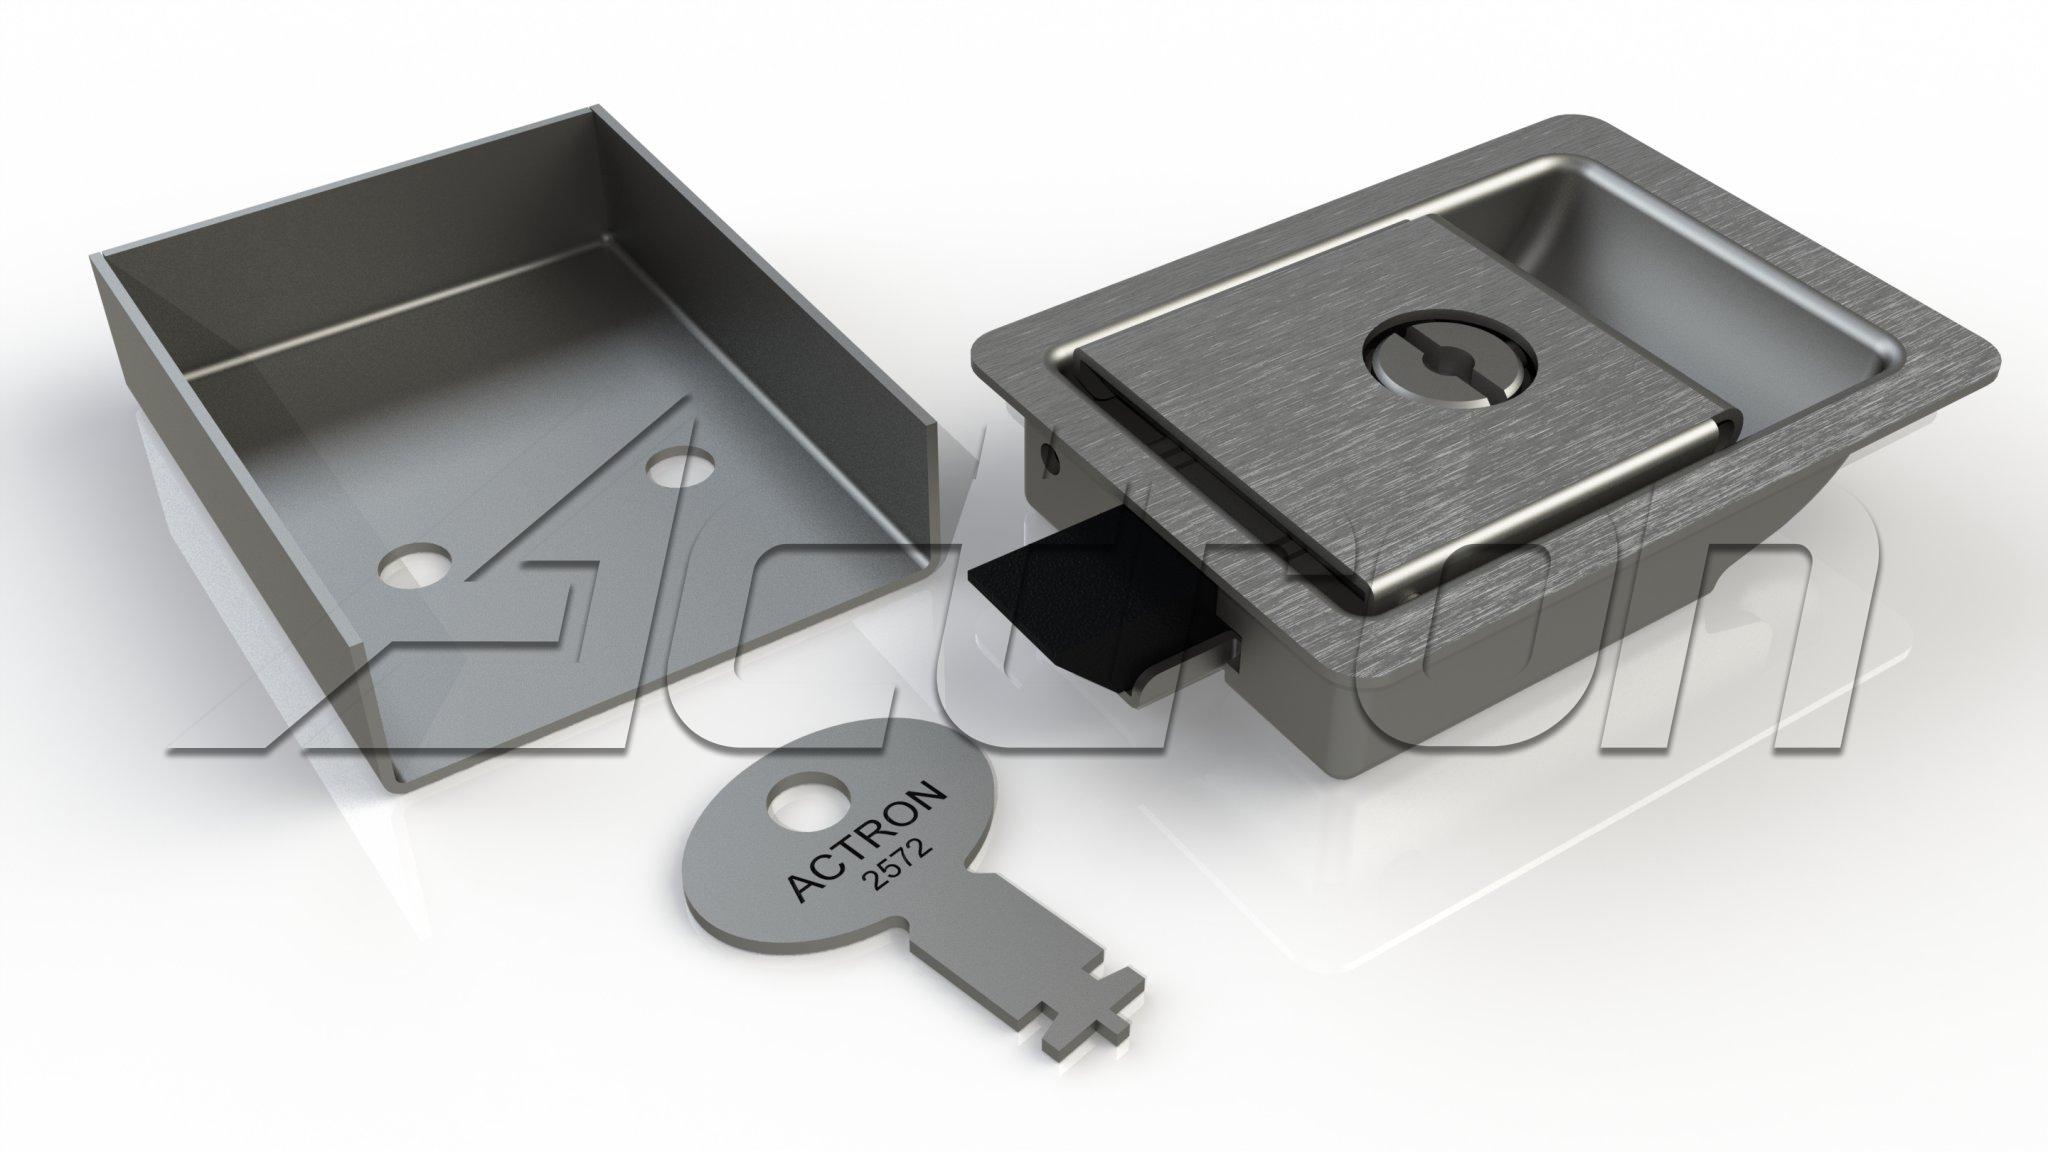 latchlock-assy-8211-paddle-4065-a23070.jpg